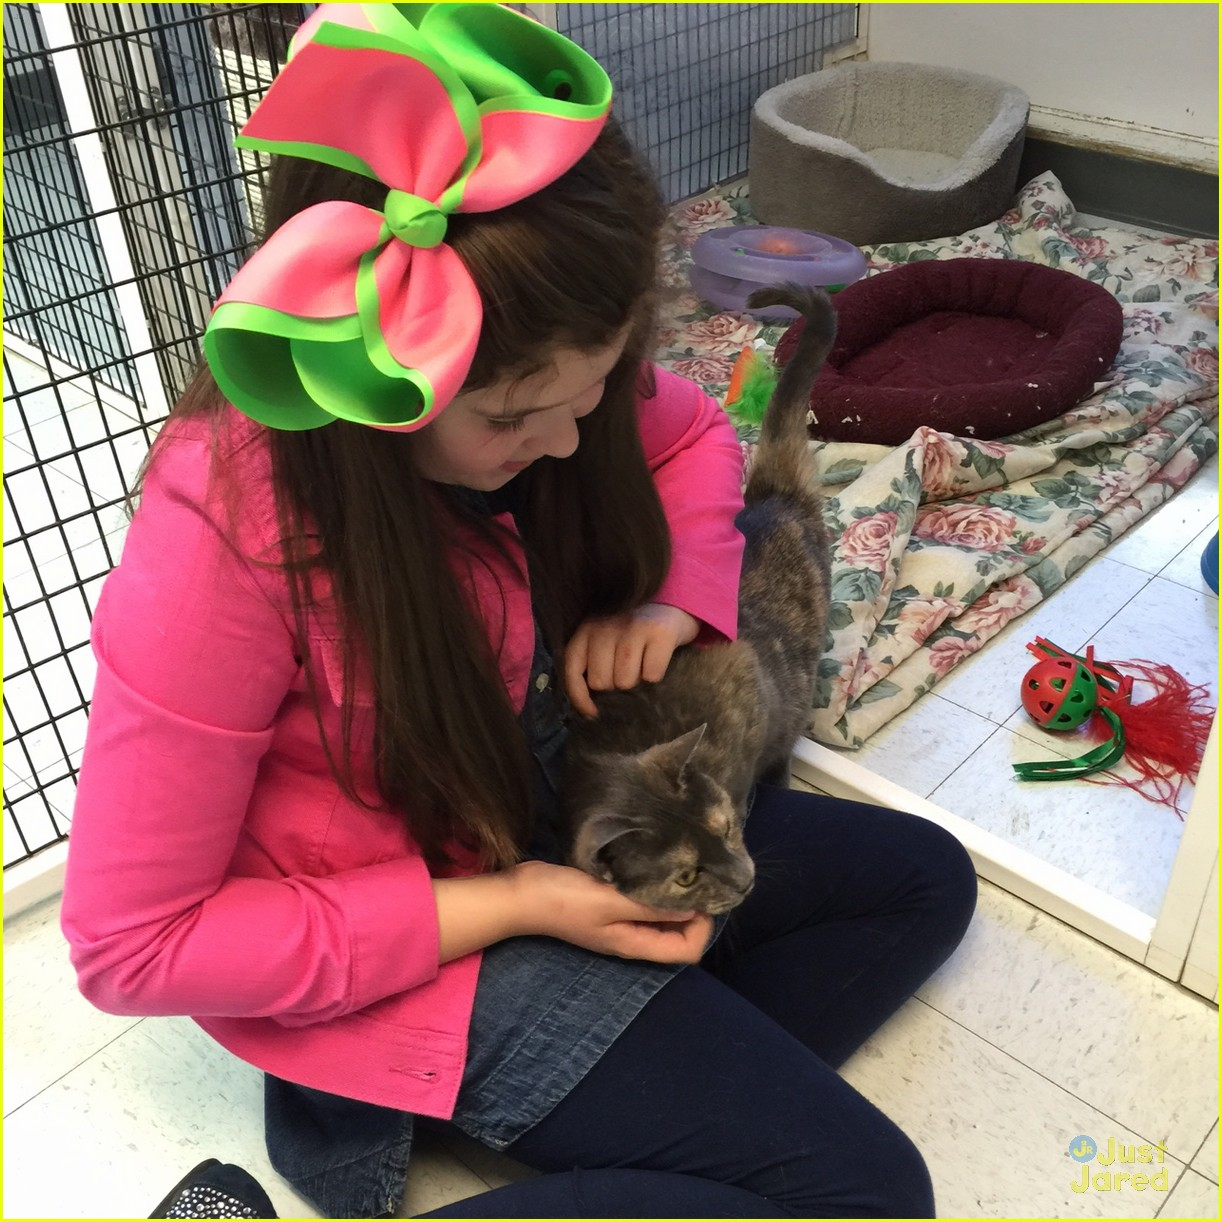 Addison Riecke - Bio, Facts, Family | Famous Birthdays